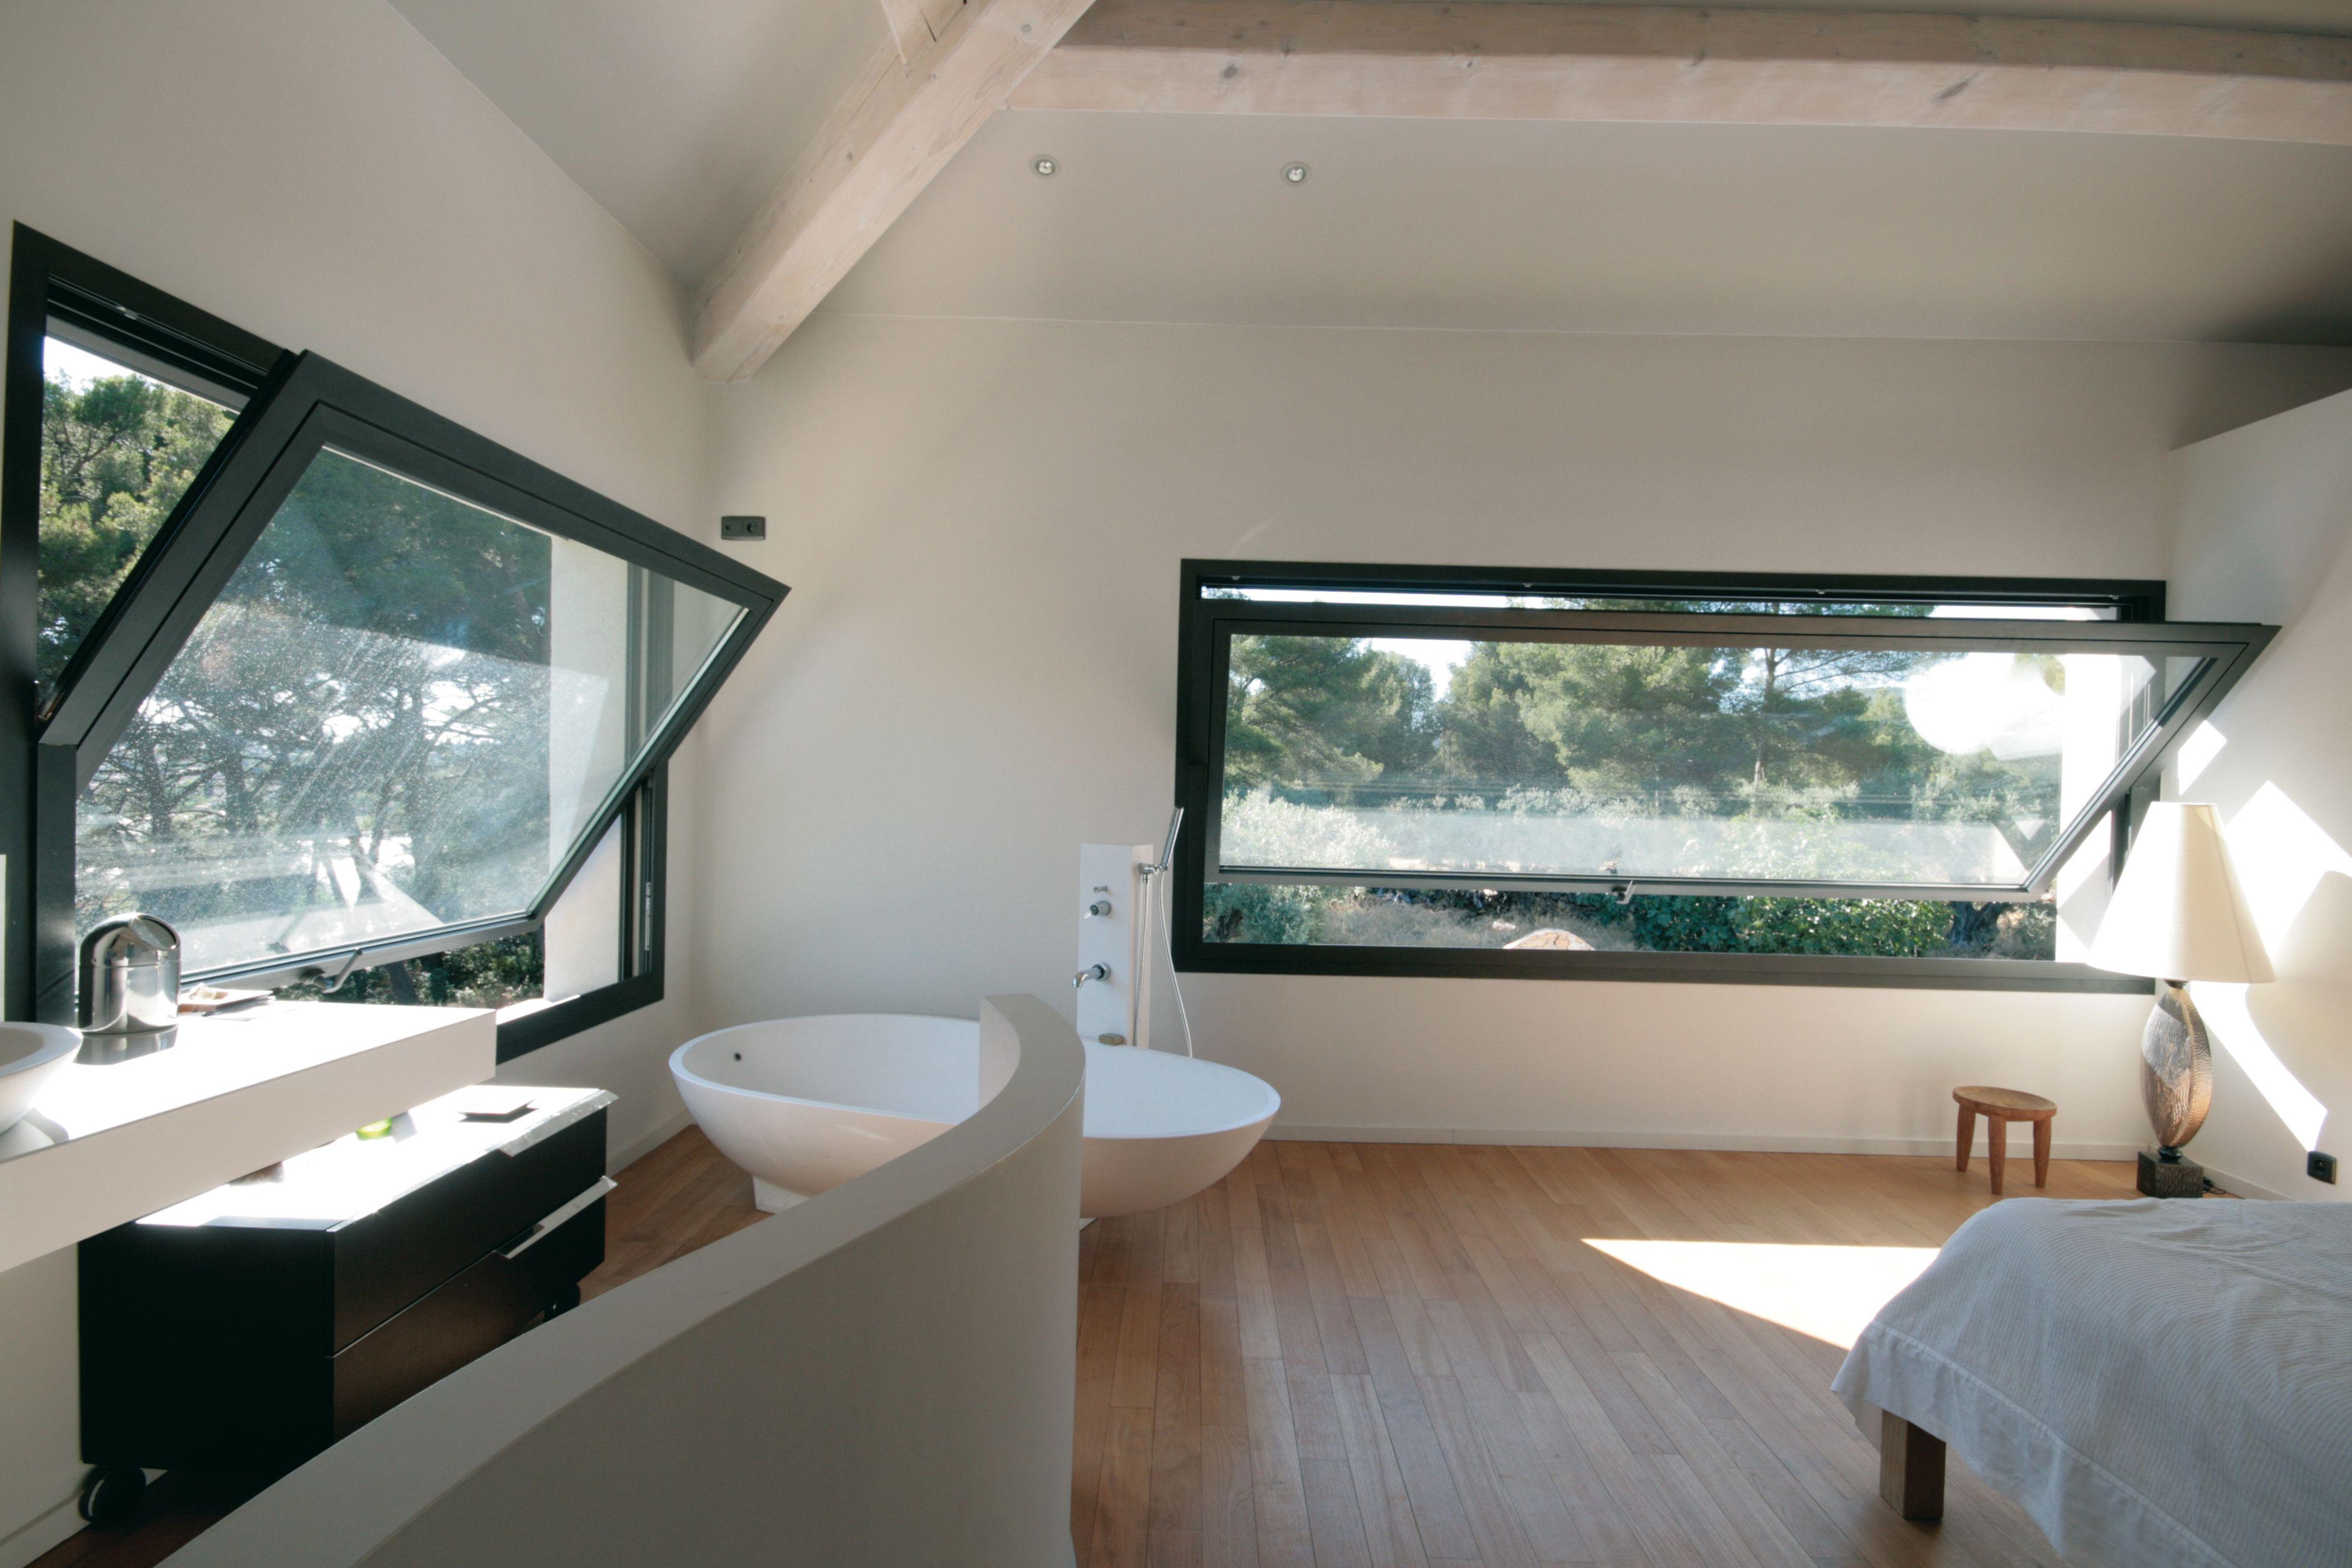 suite parentale avec salle de bain design. grande ouverture en ... - Suite Parentale Avec Salle De Bain